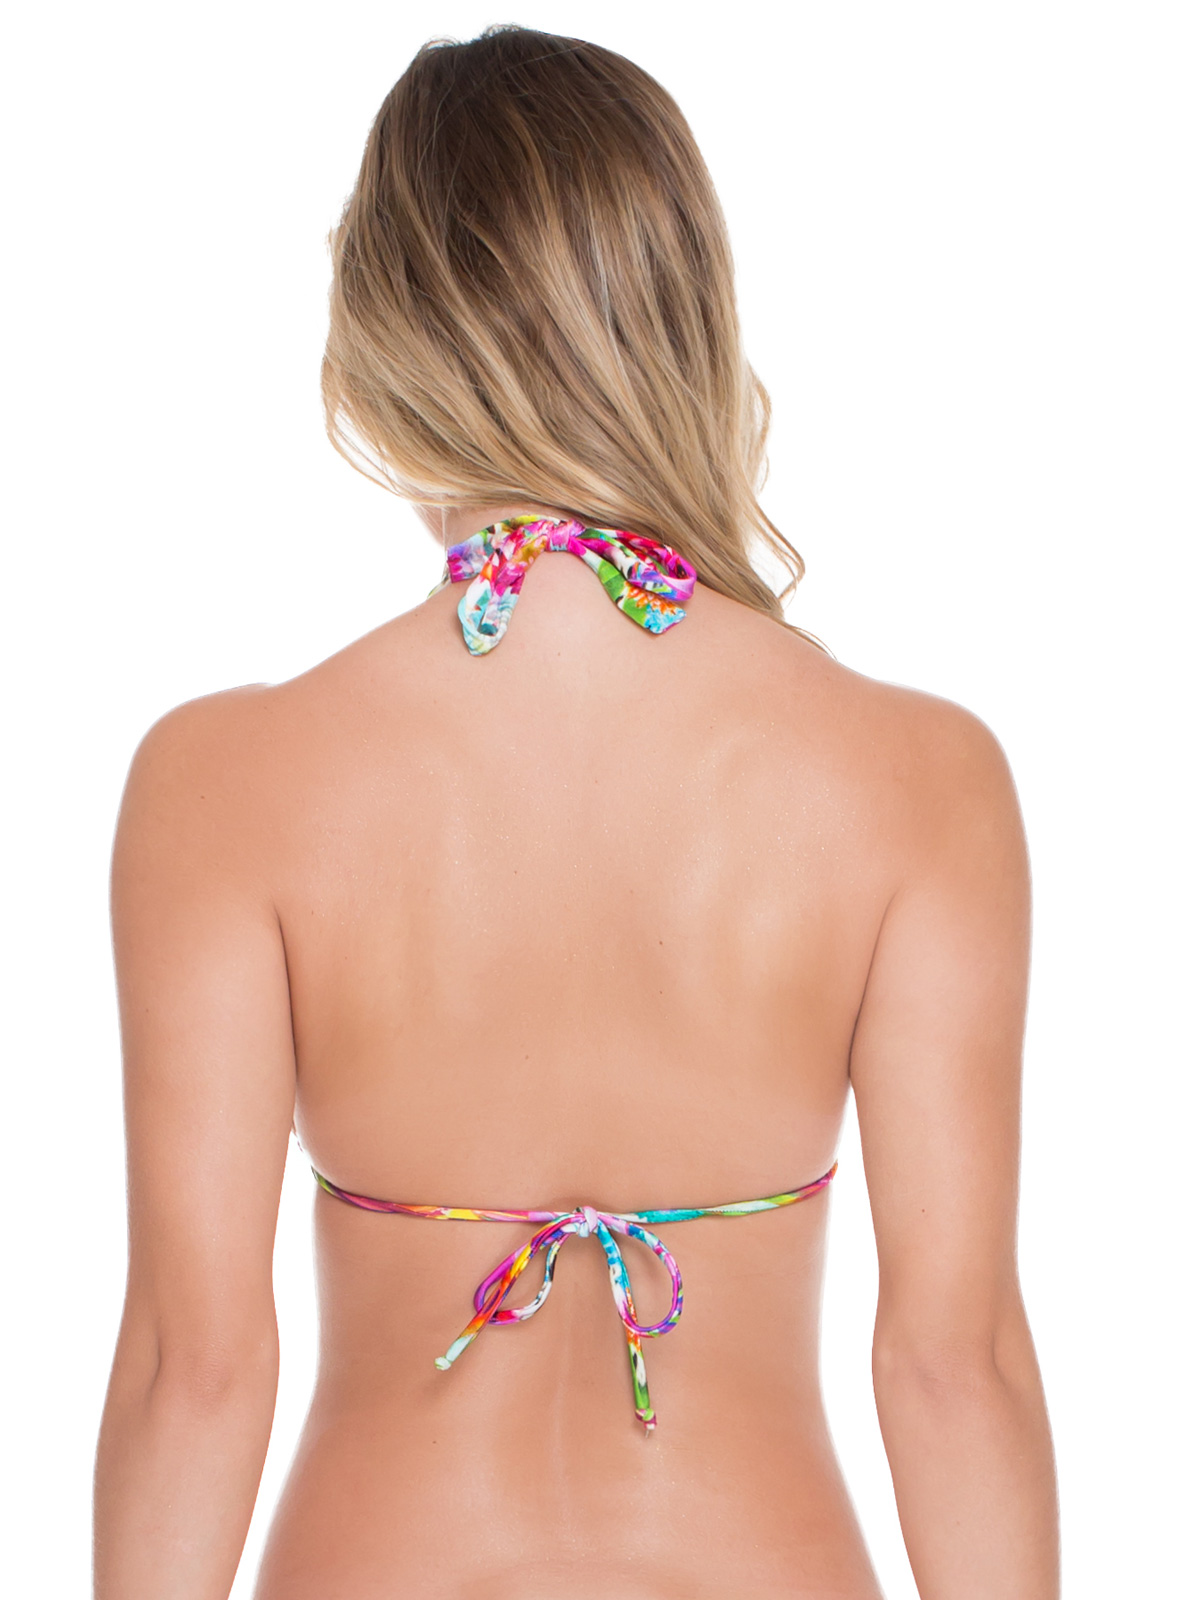 Adjustable halter bikini can tell